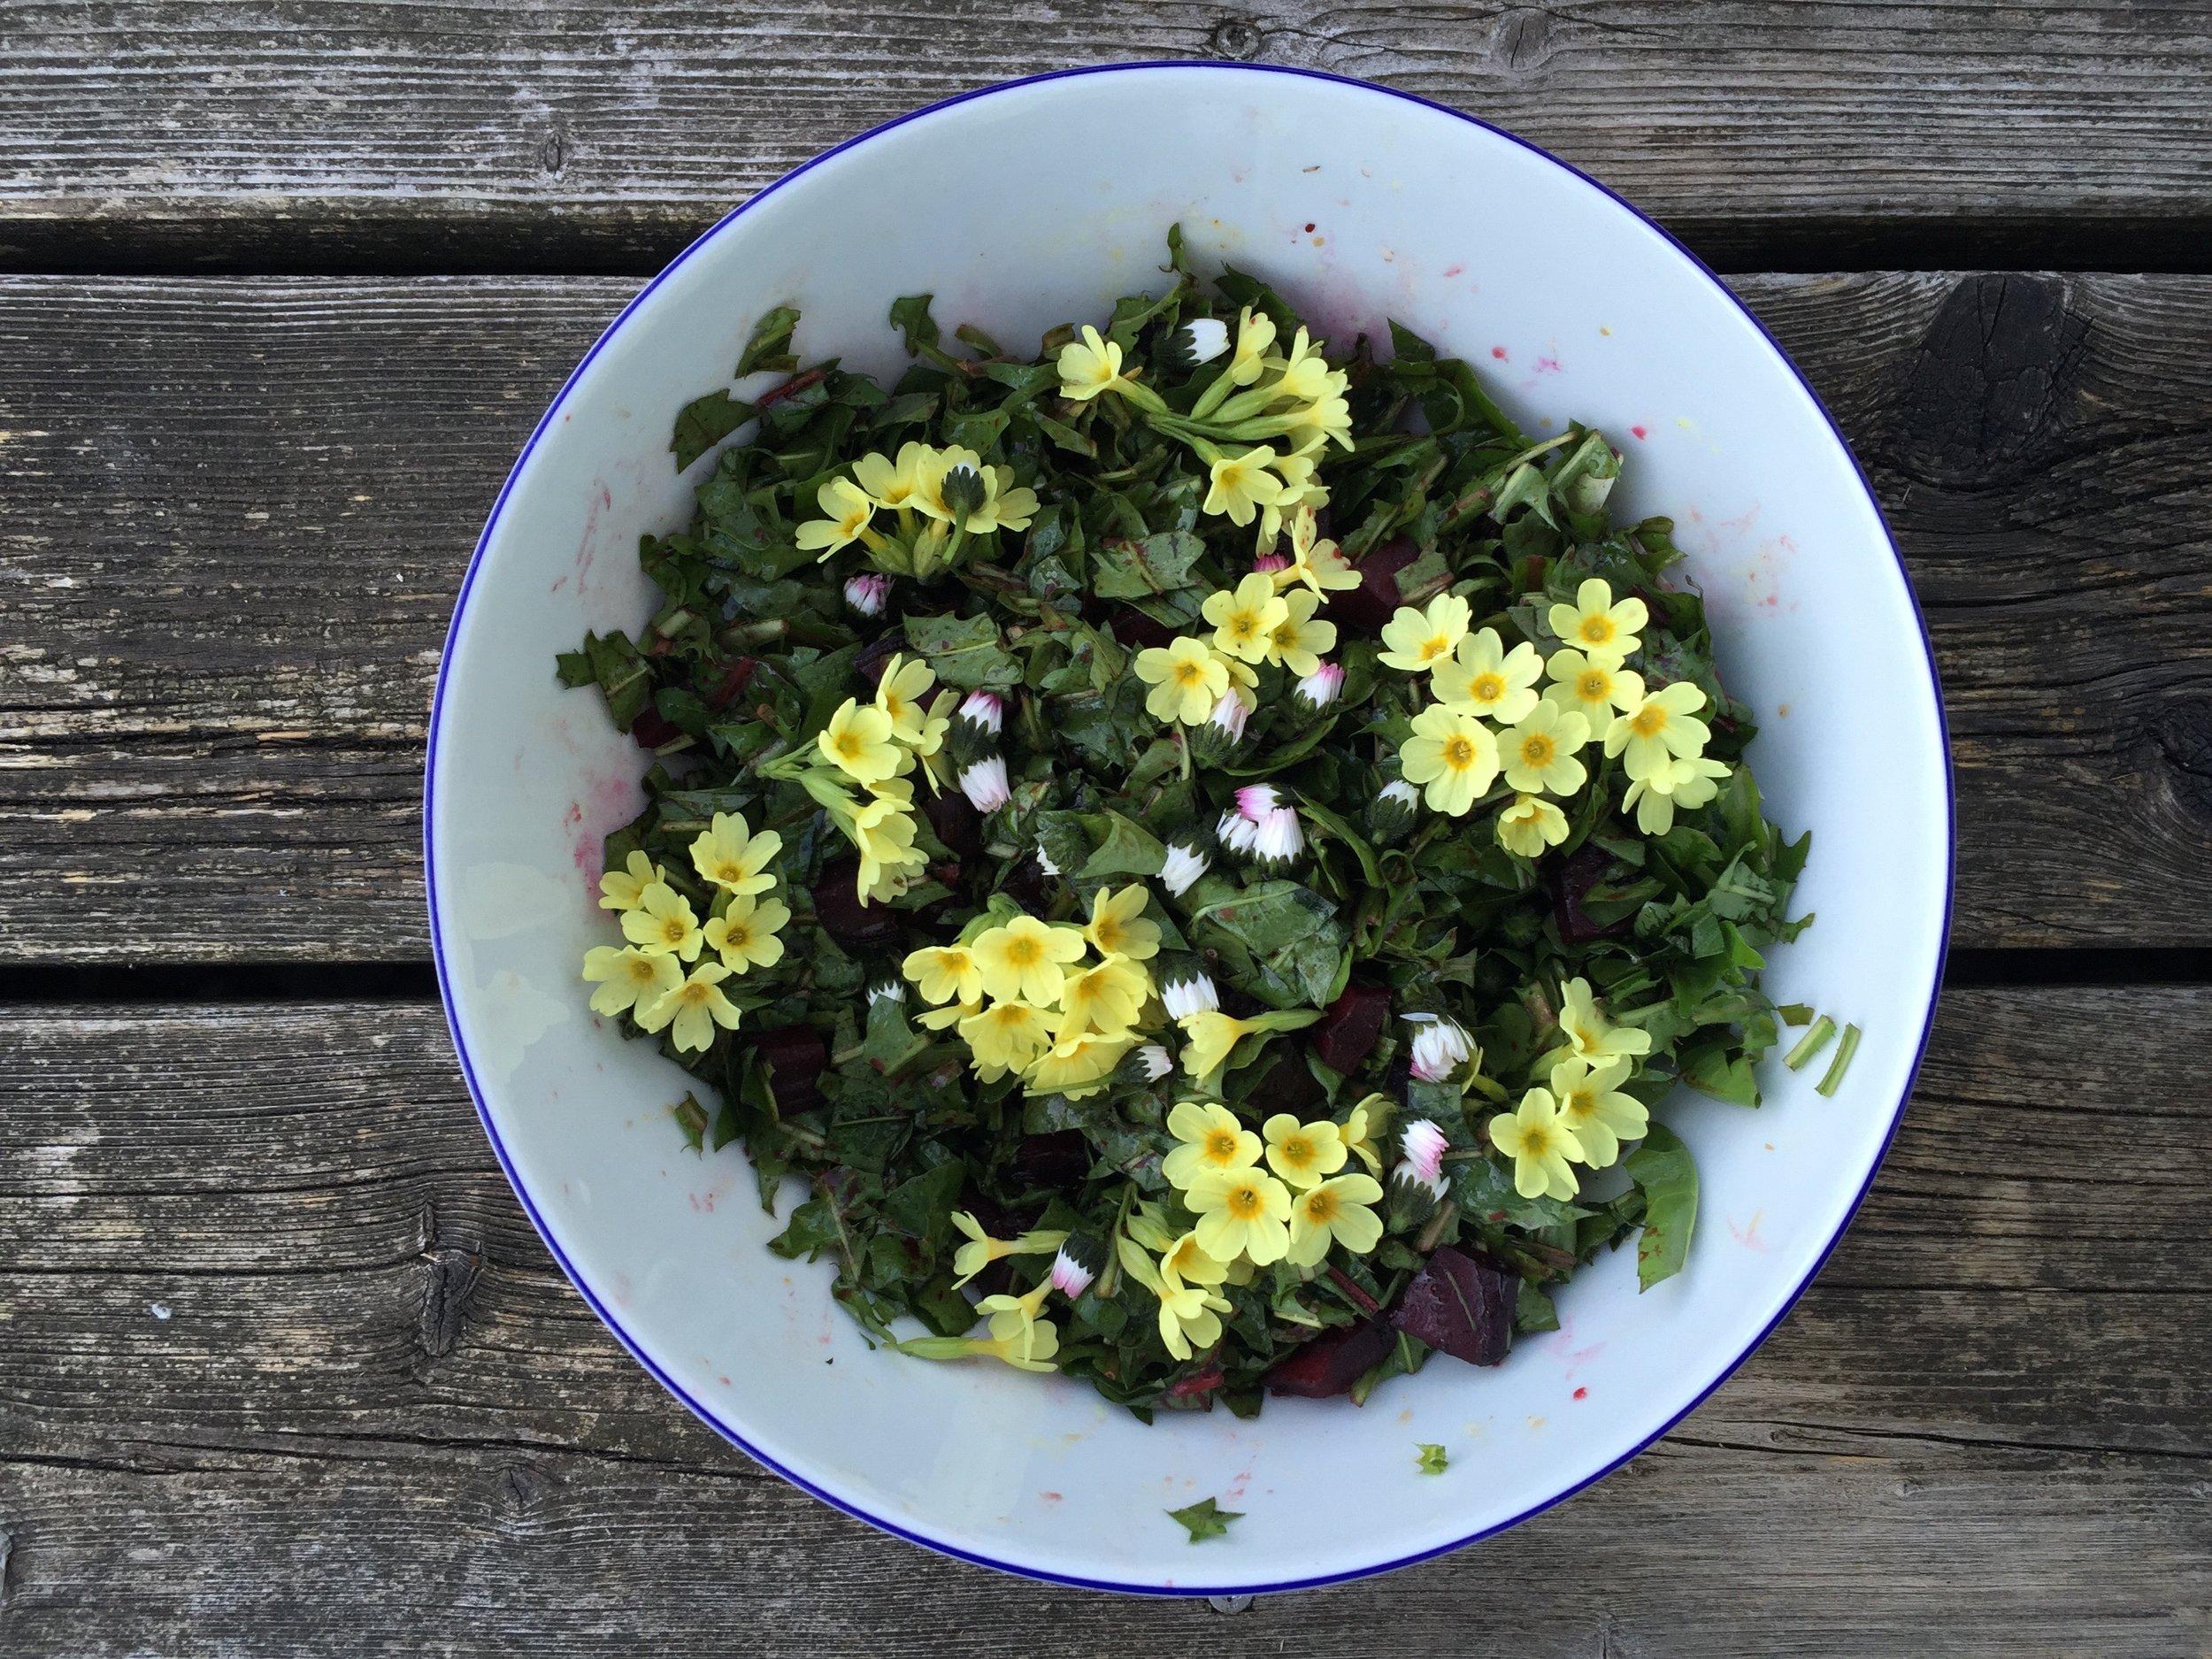 Löwenzahn Rote-Rüben Salat mit Himmelschlüssel_Nina Mandl TCM.jpg